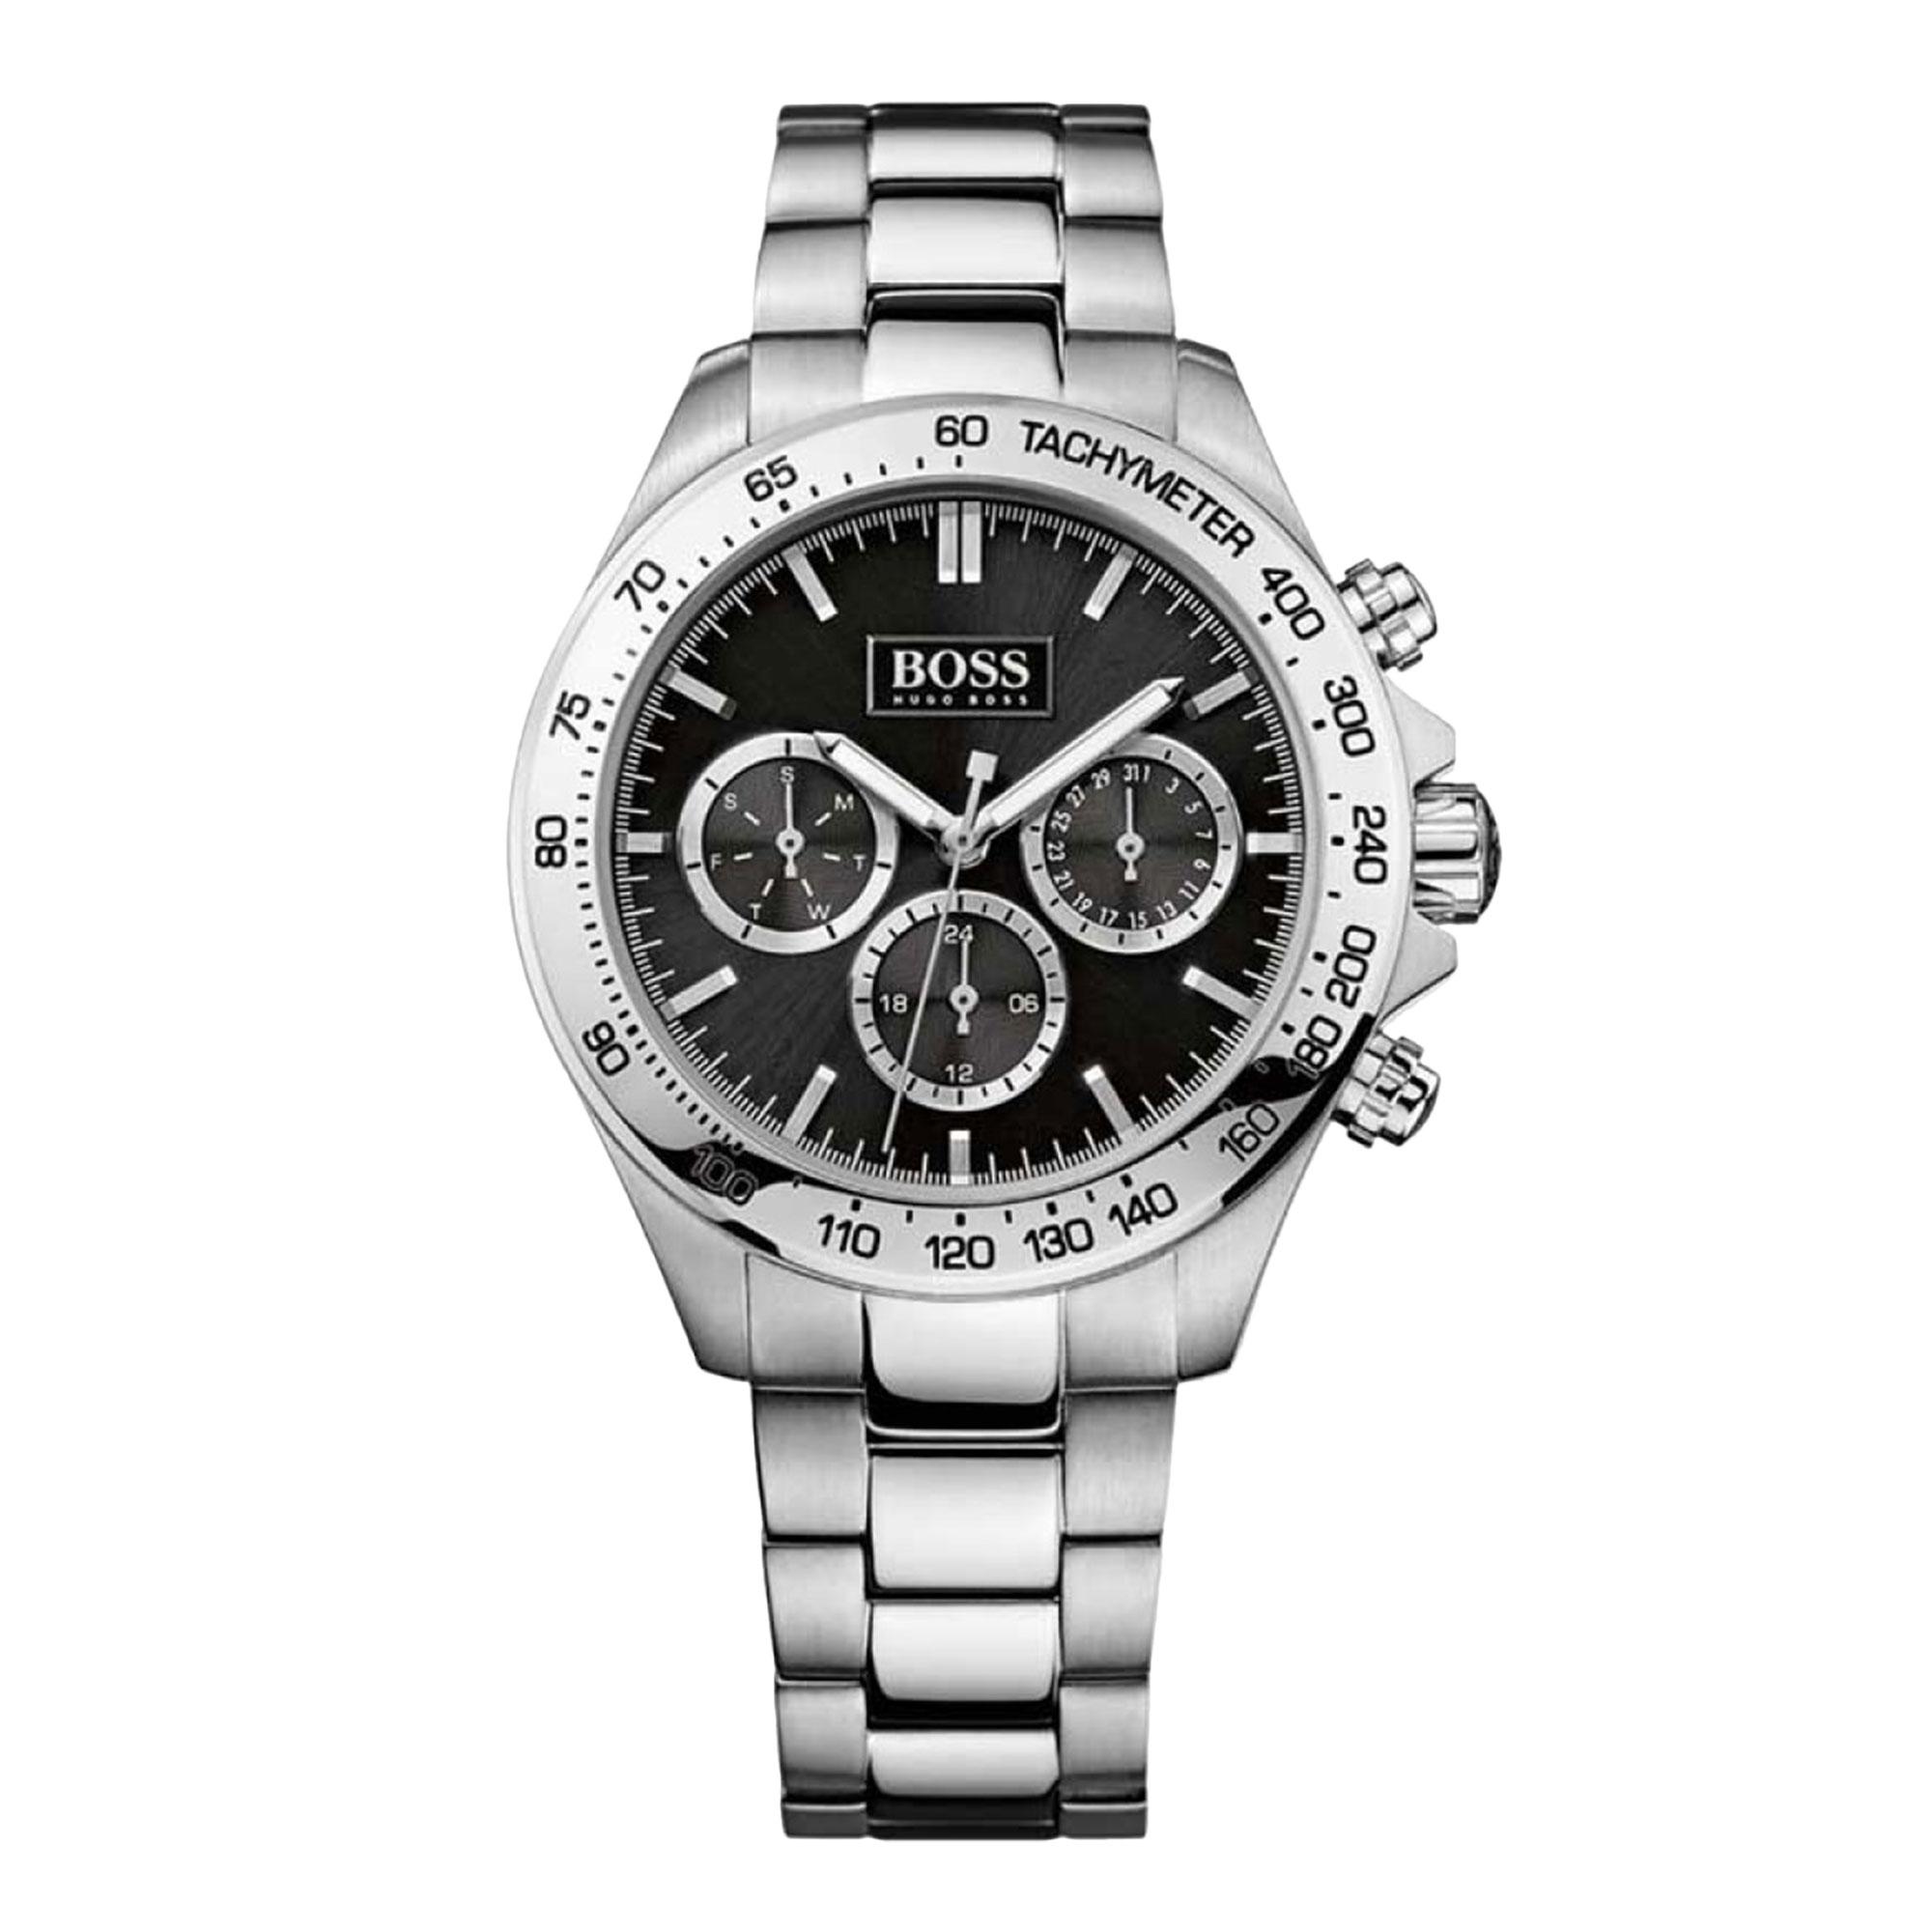 Hugo Boss HB1512965 - herenhorloge -59%